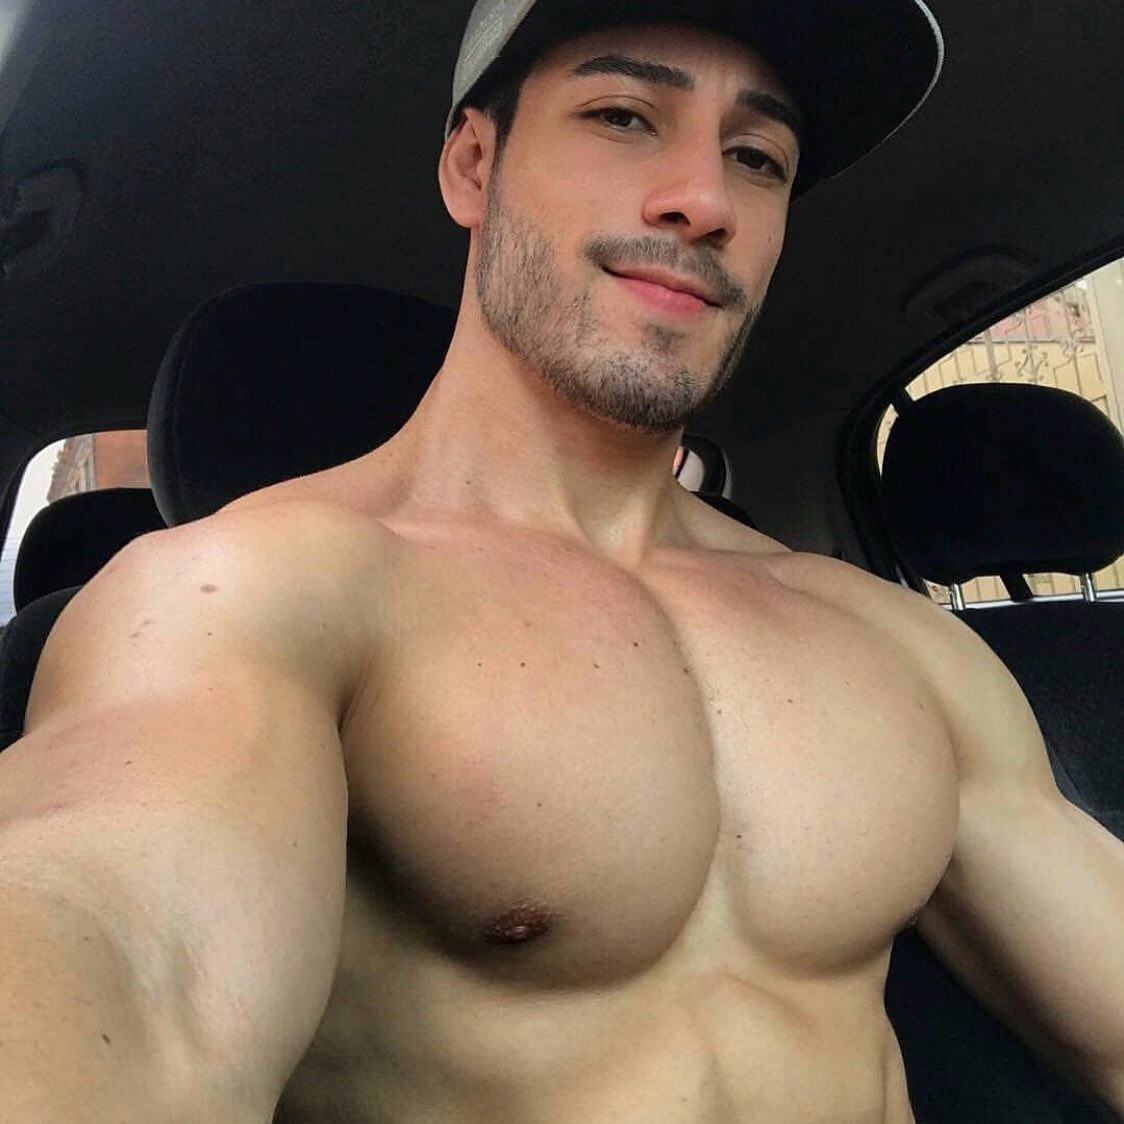 #men #muscle #hat #hotmen #smile